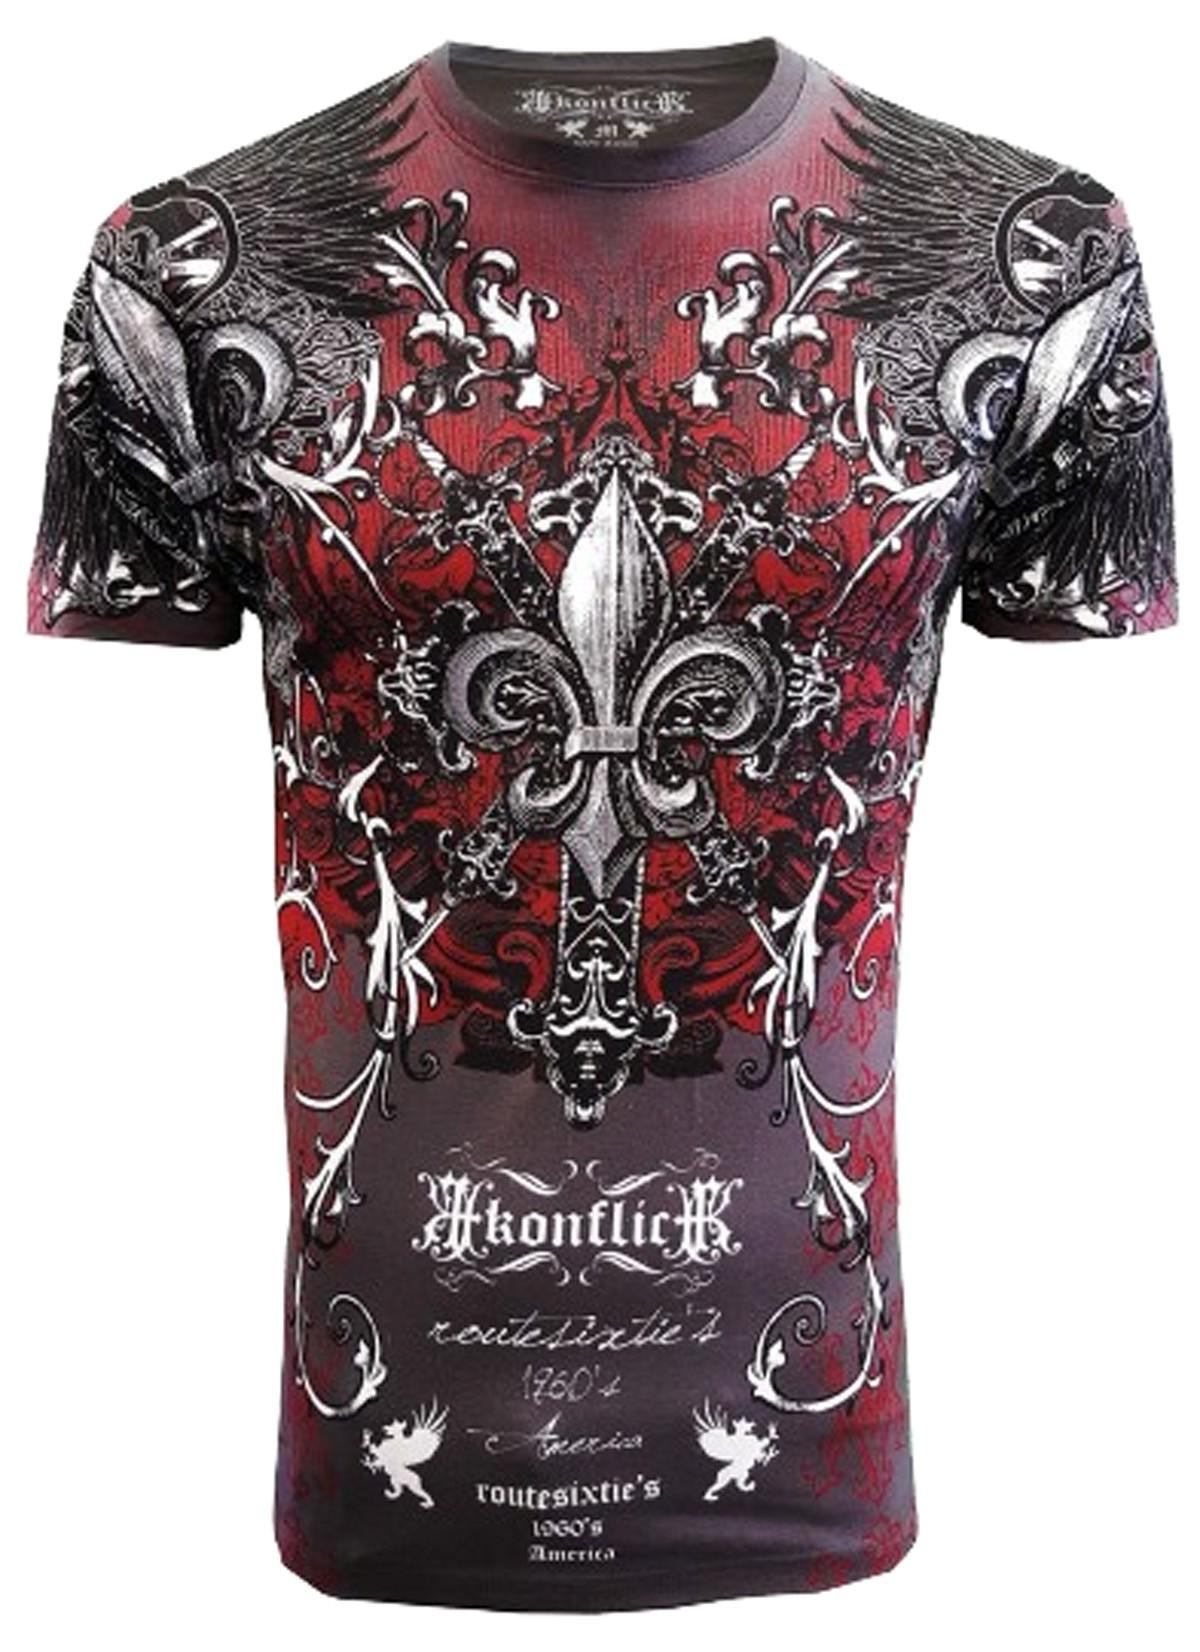 Konflic Clothing - Crosses Forever T-Shirt